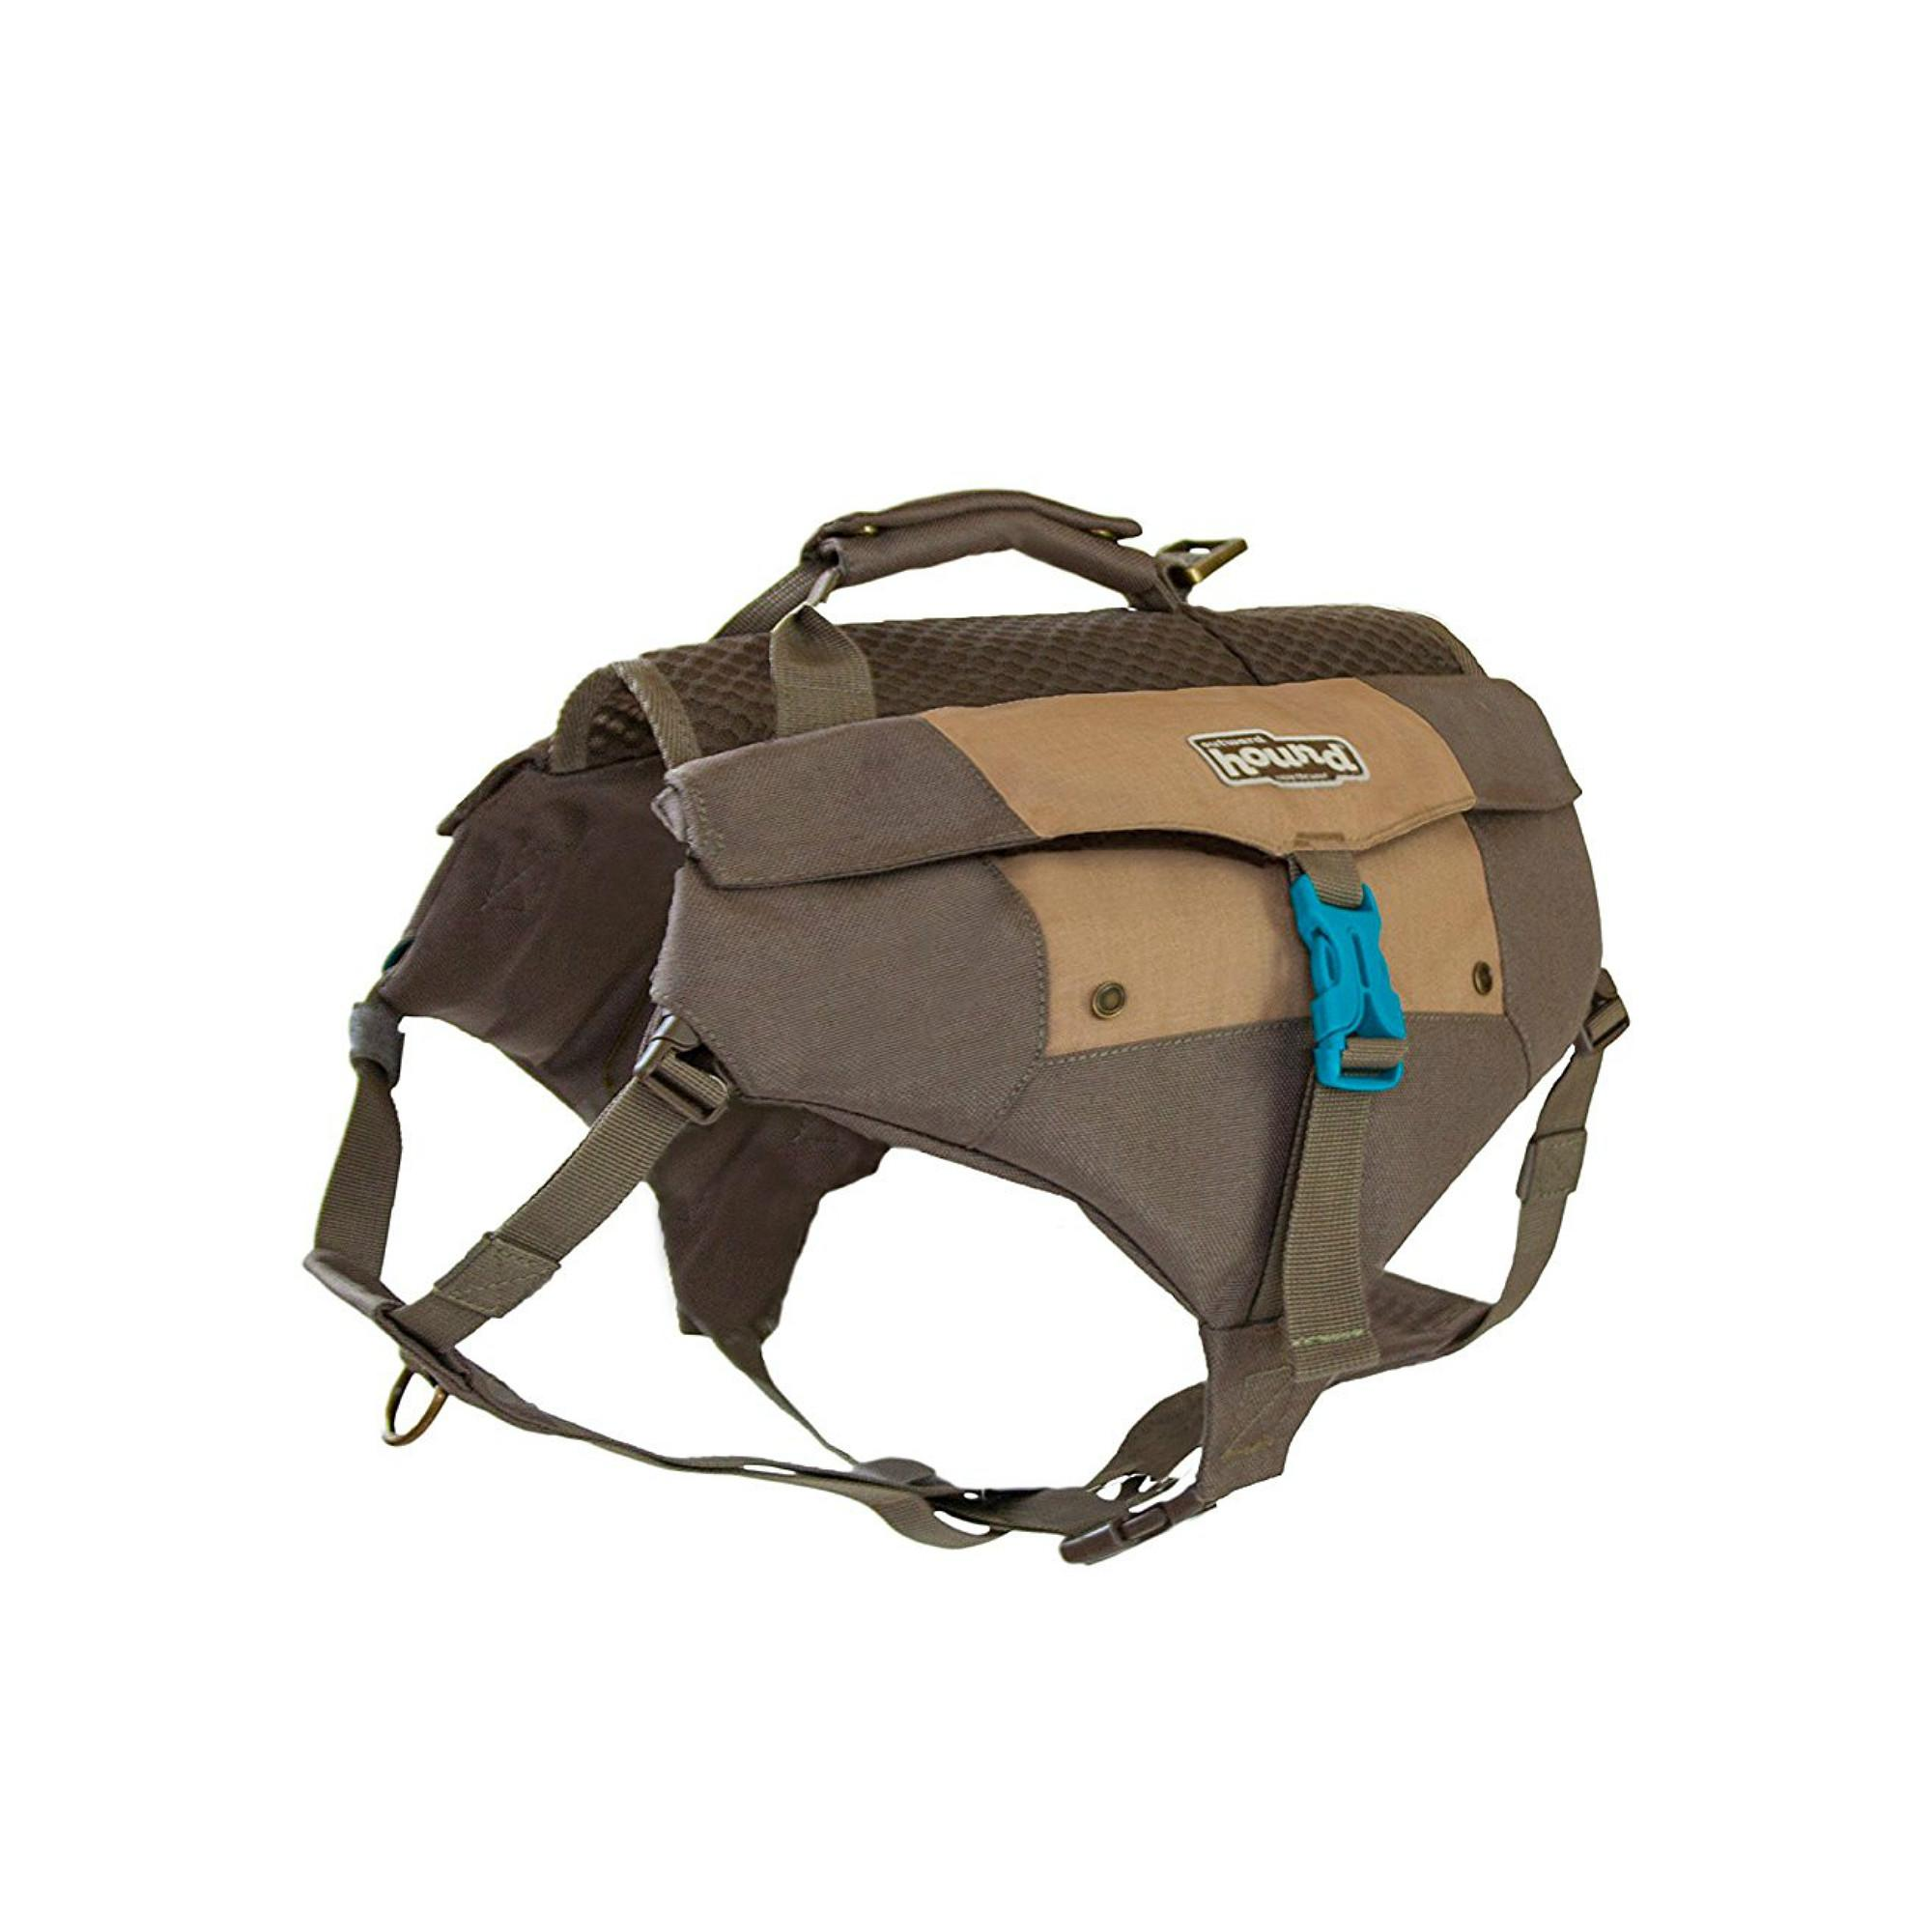 Outward Hound Denver Urban Dog Pack